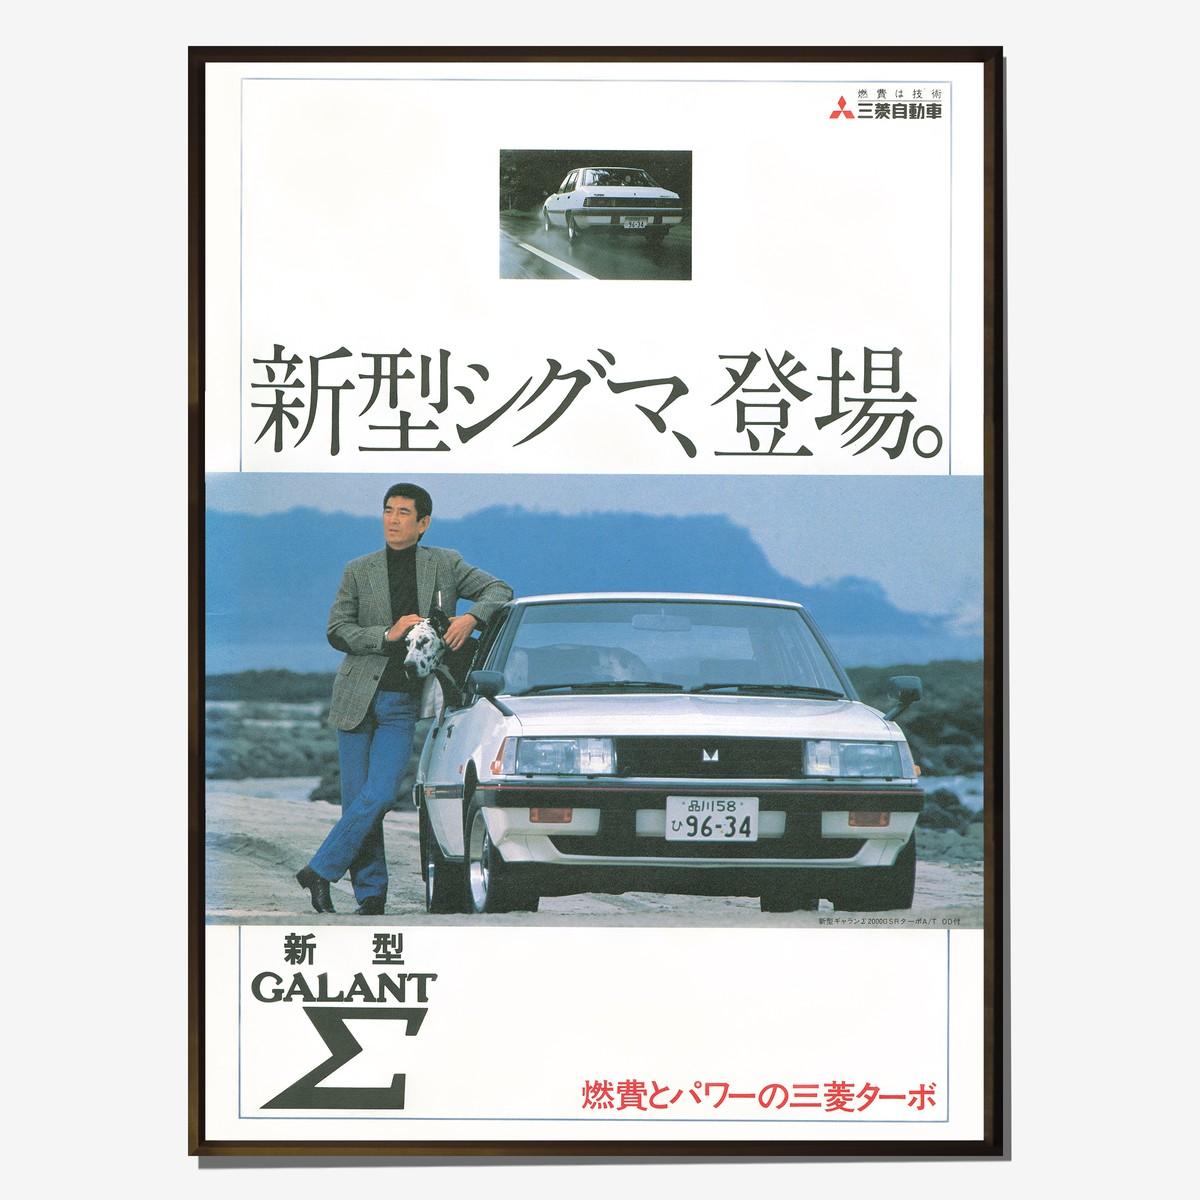 Photo of Mitsubishi Galant Vintage Advertising Poster